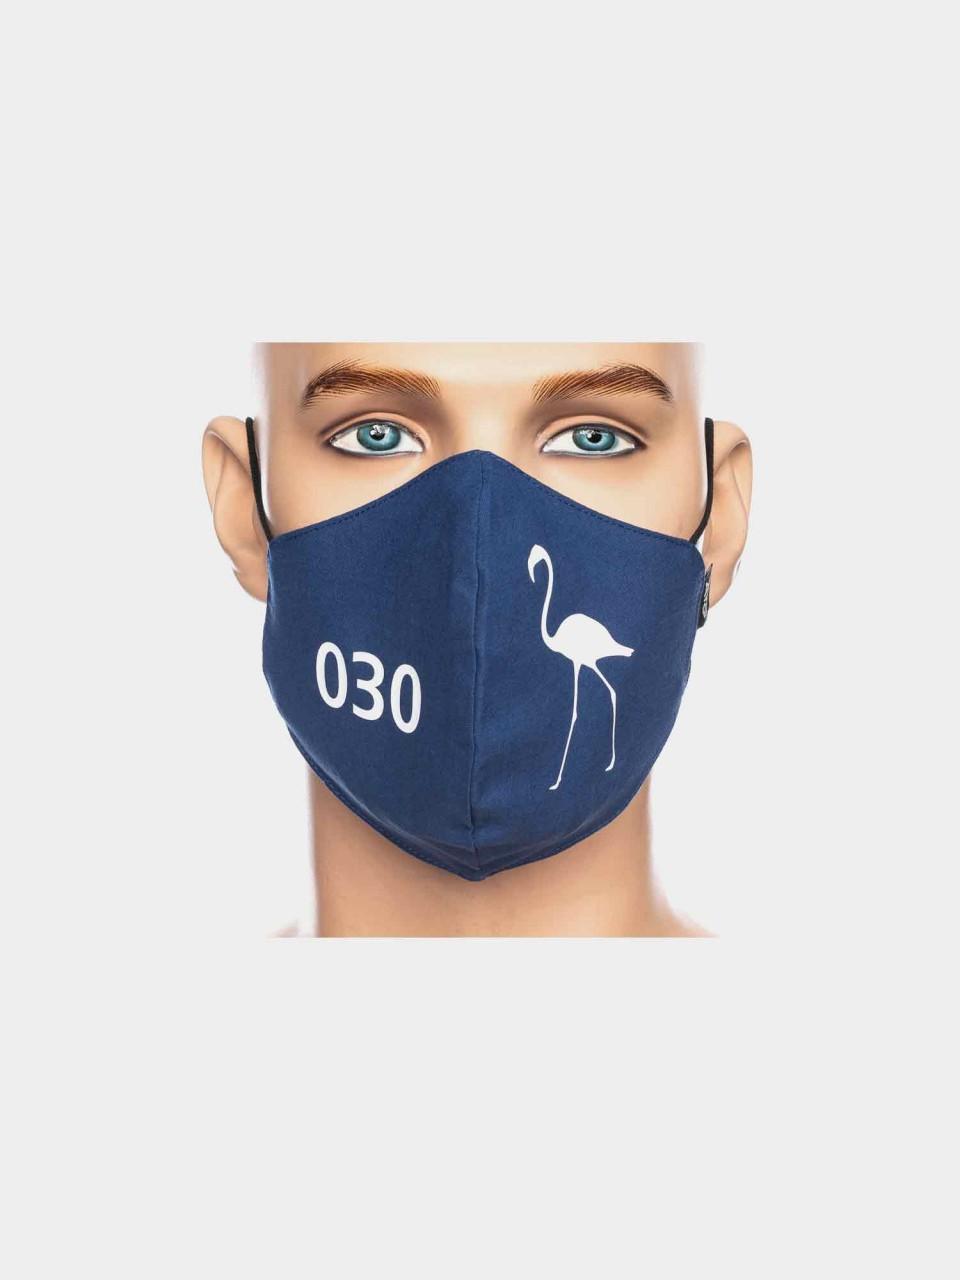 ATO Maske 030 Flamingo blau/weiß